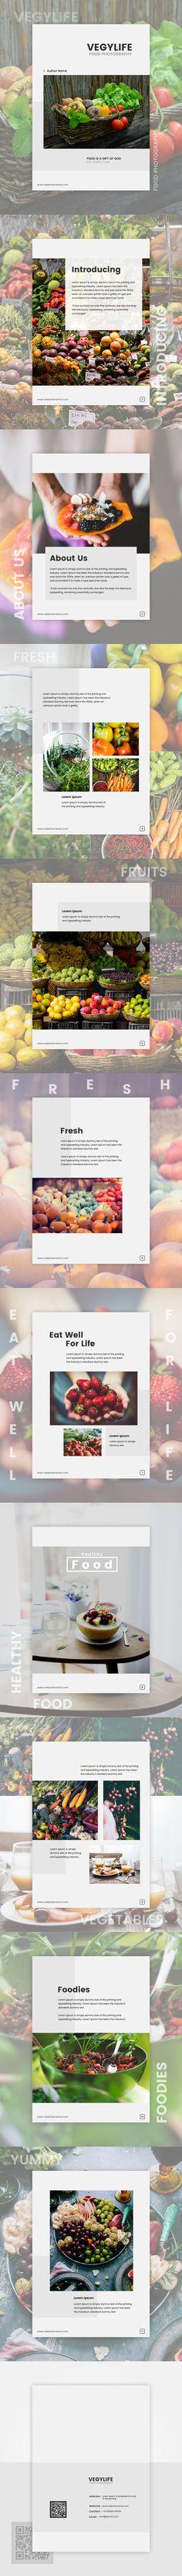 #brochure #food #VEGYLIFE #fruits #vegetables #healthy food #graphics design #print media